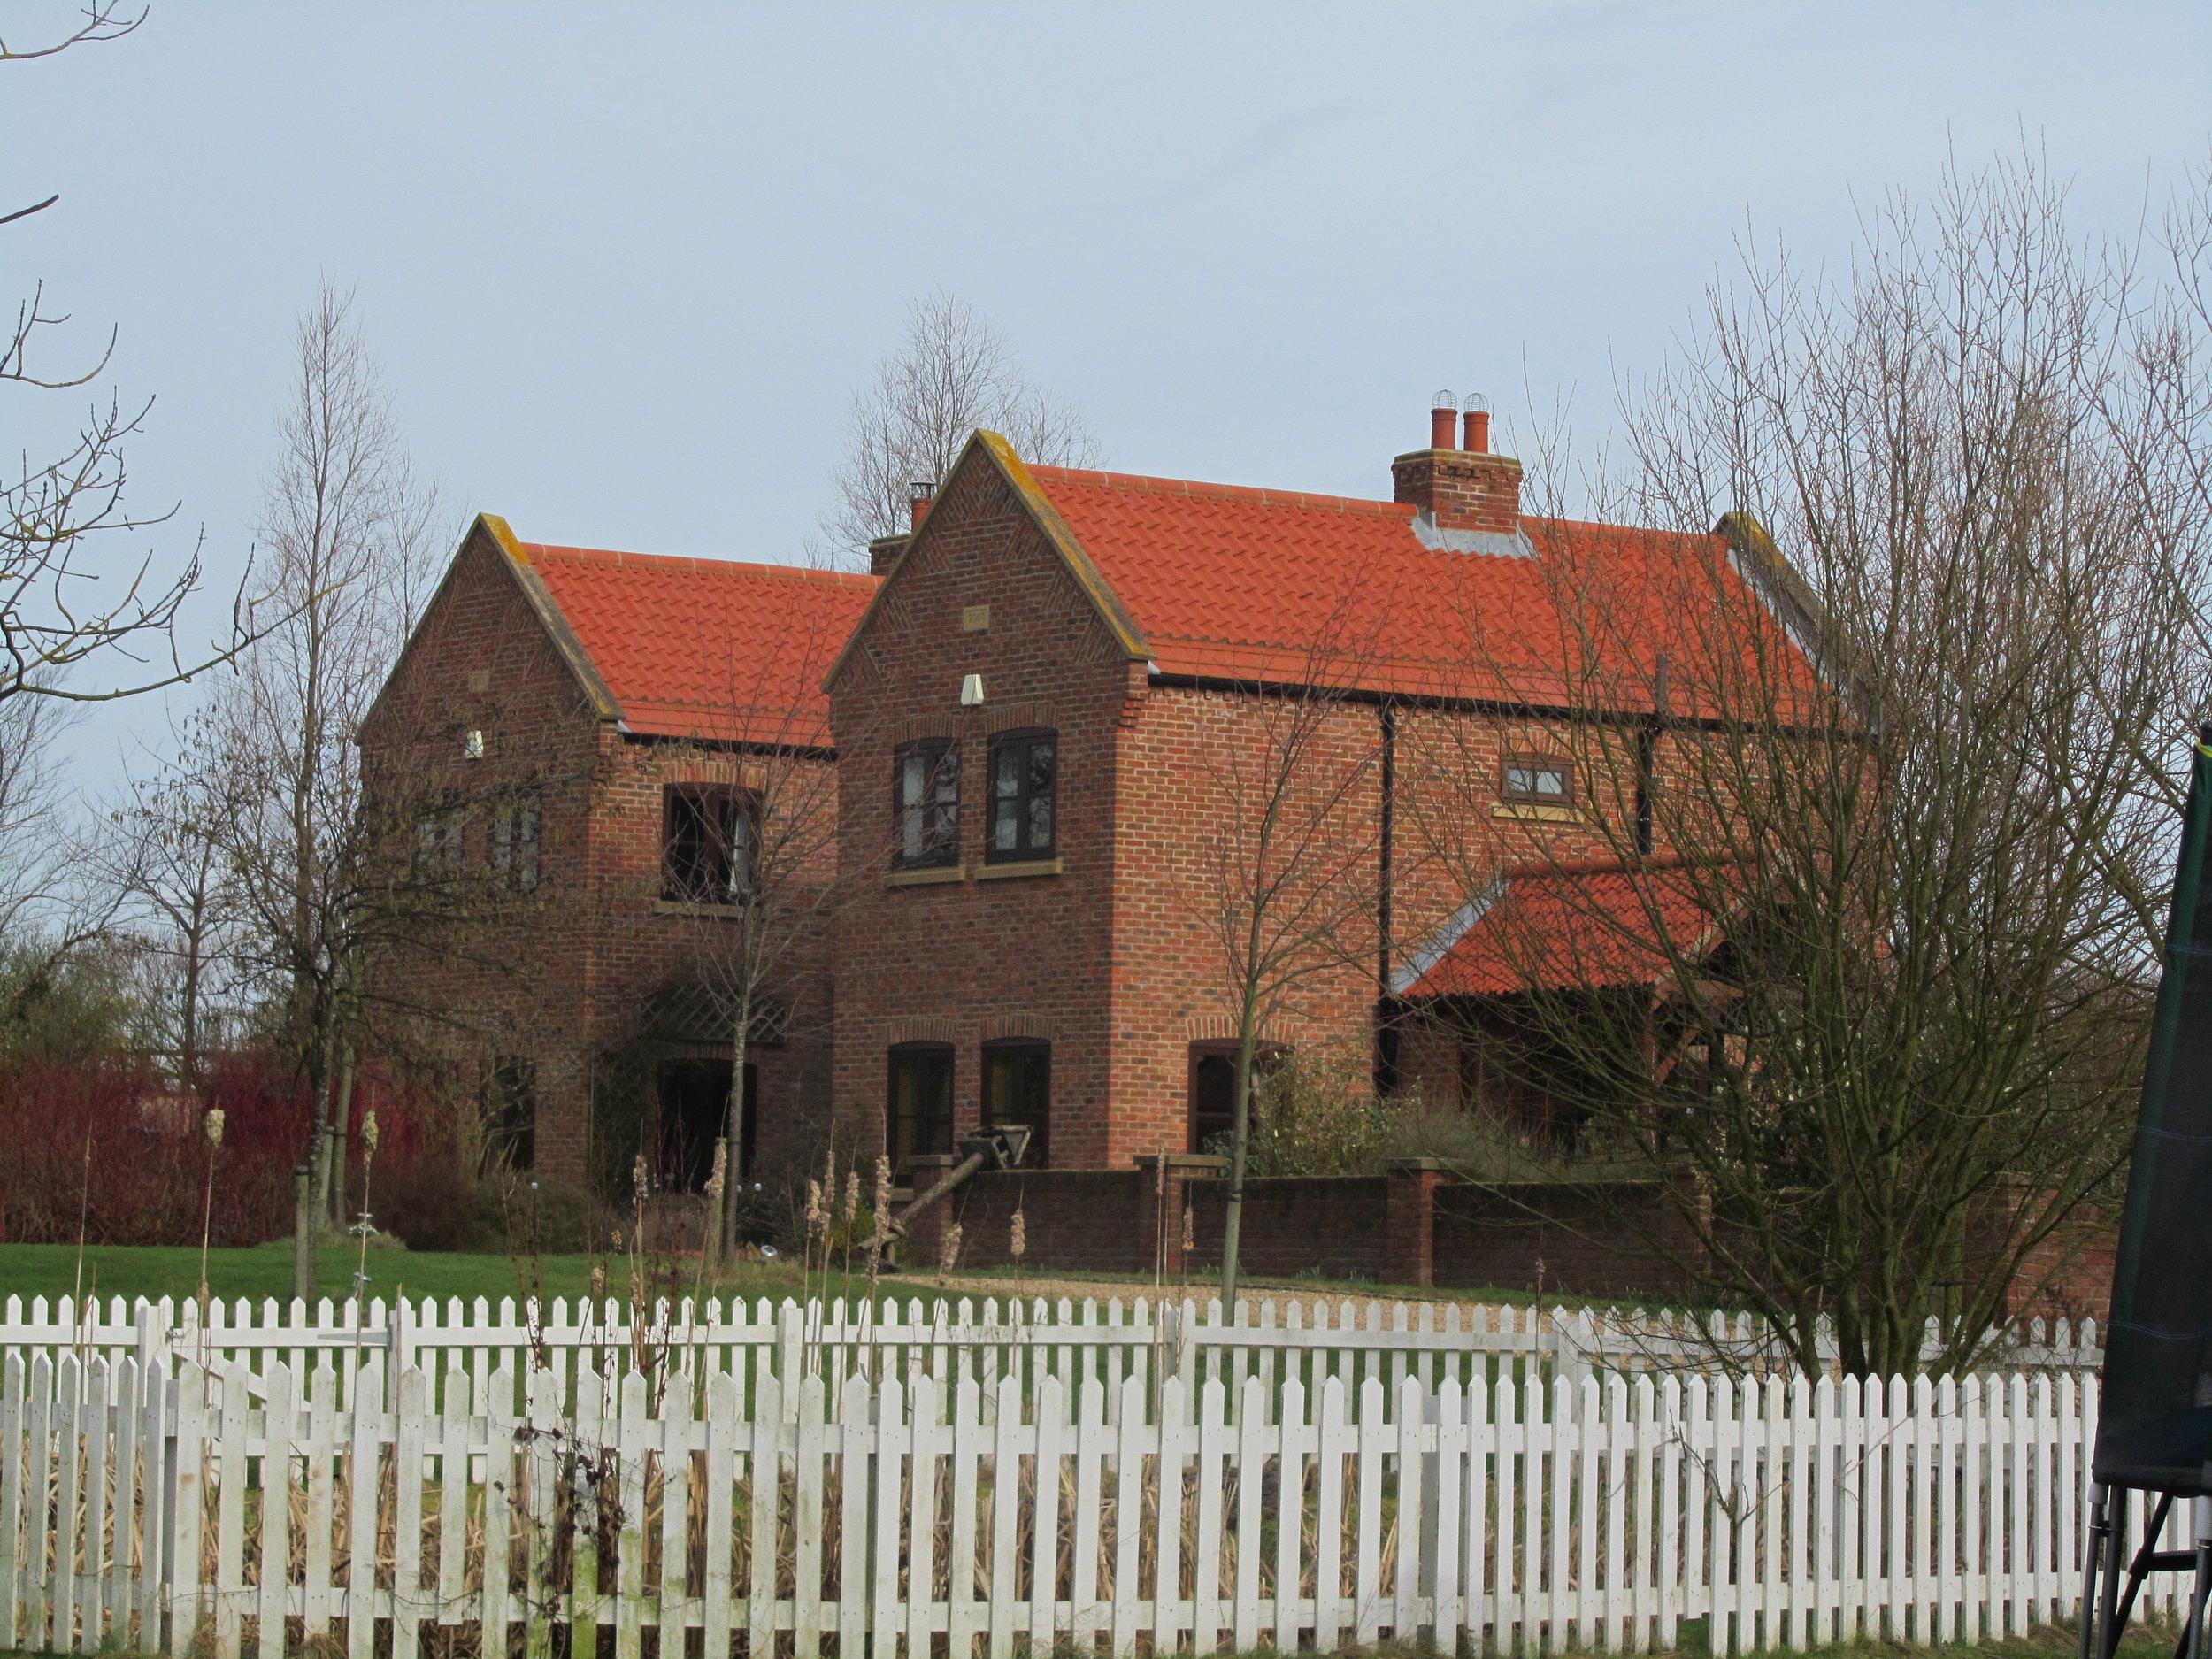 Exterior 1 - North End Farm - East Yorkshire Architects - Samuel Kendall Associates